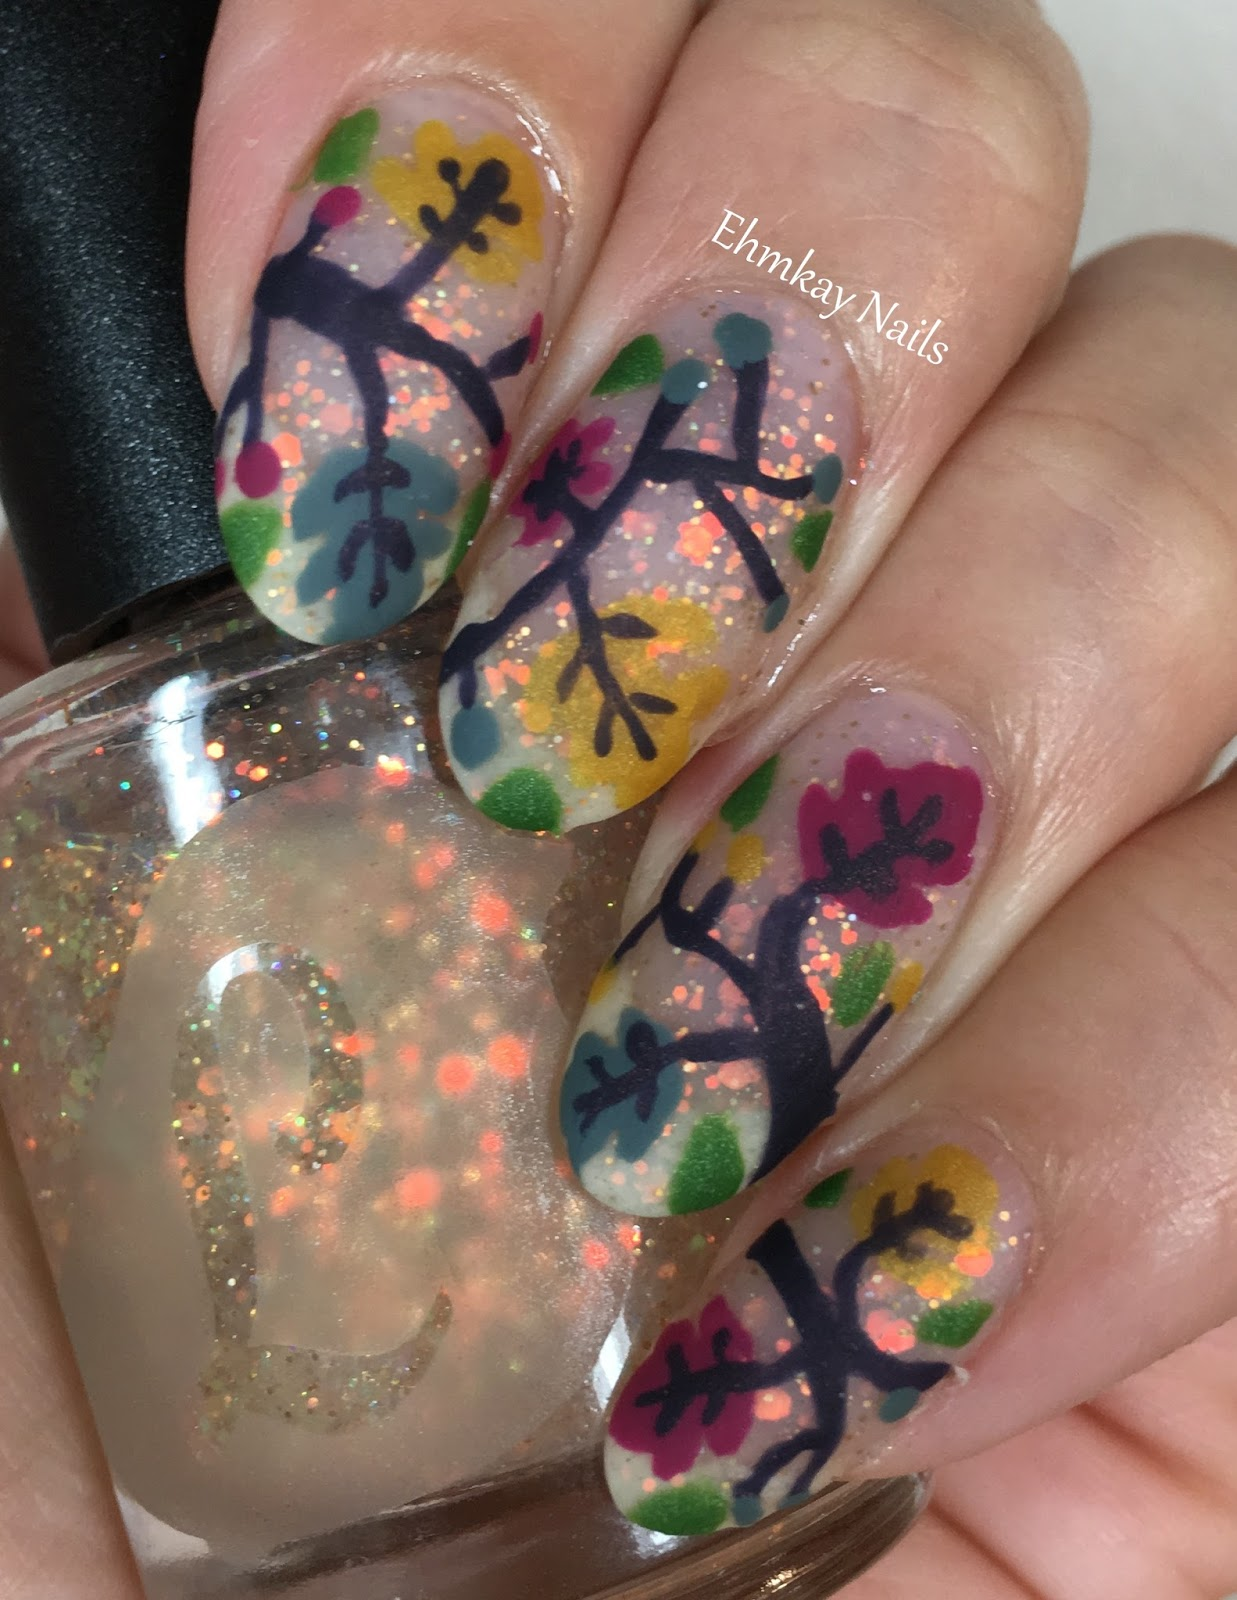 ehmkay nails: Lou It Yourself Fallfetti Collection Nail Art: Autumn ...